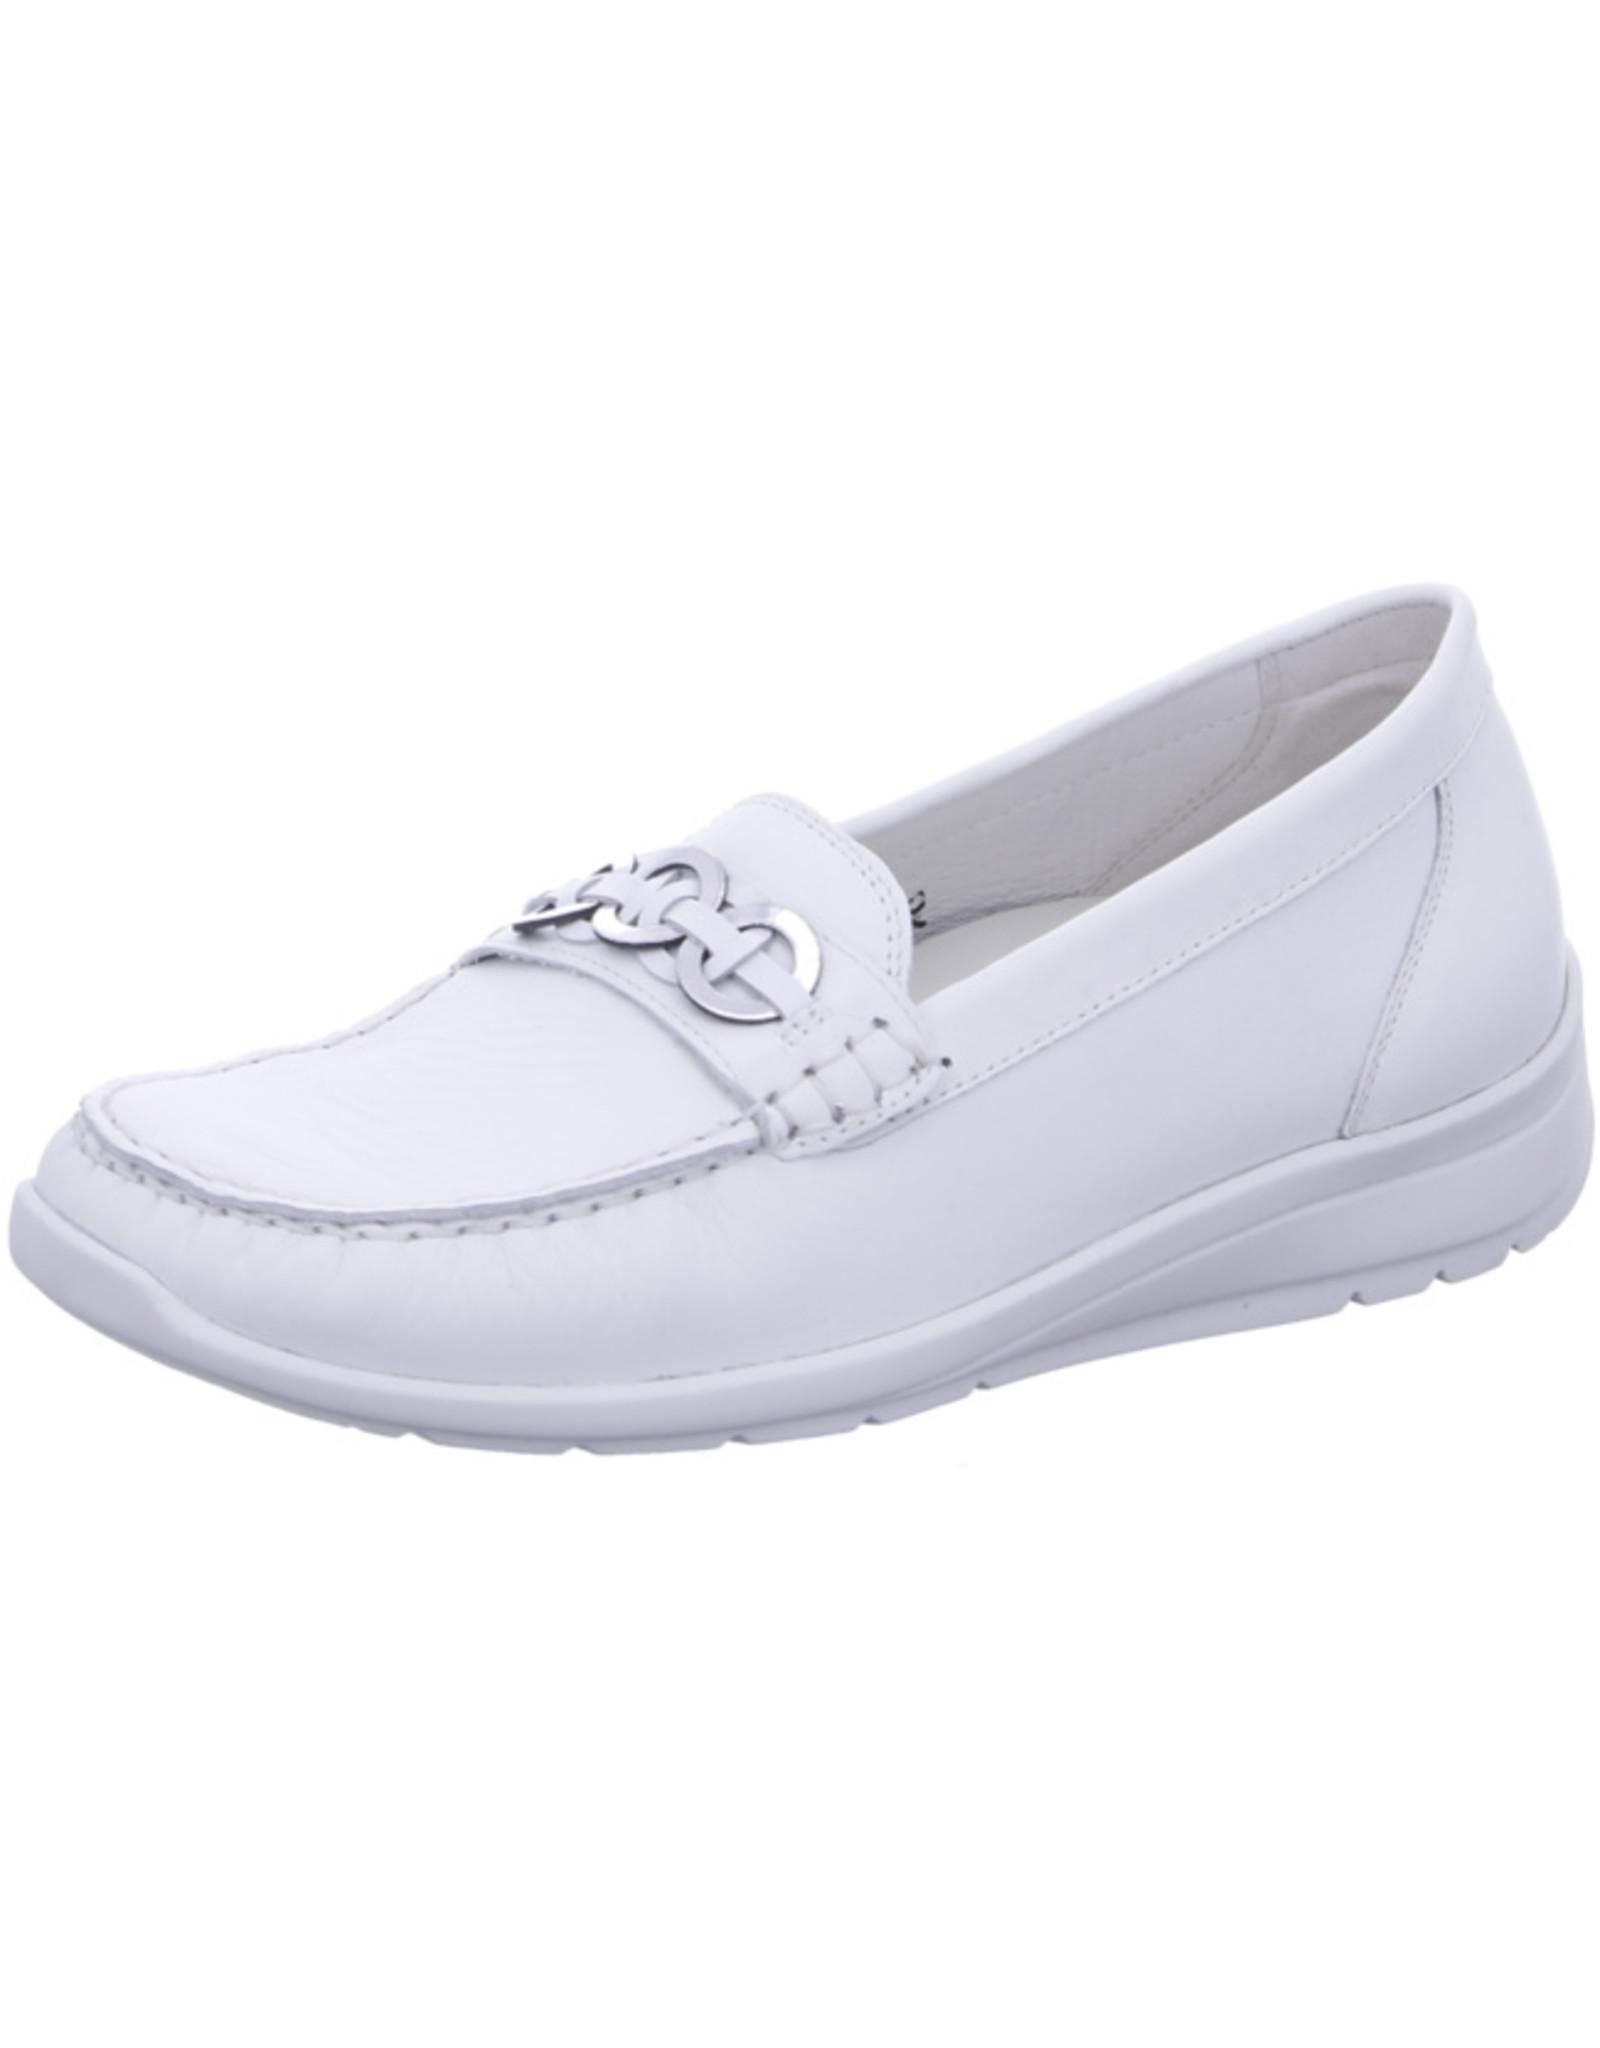 Waldlaufer Waldlaufer - Witte Loafer Dames